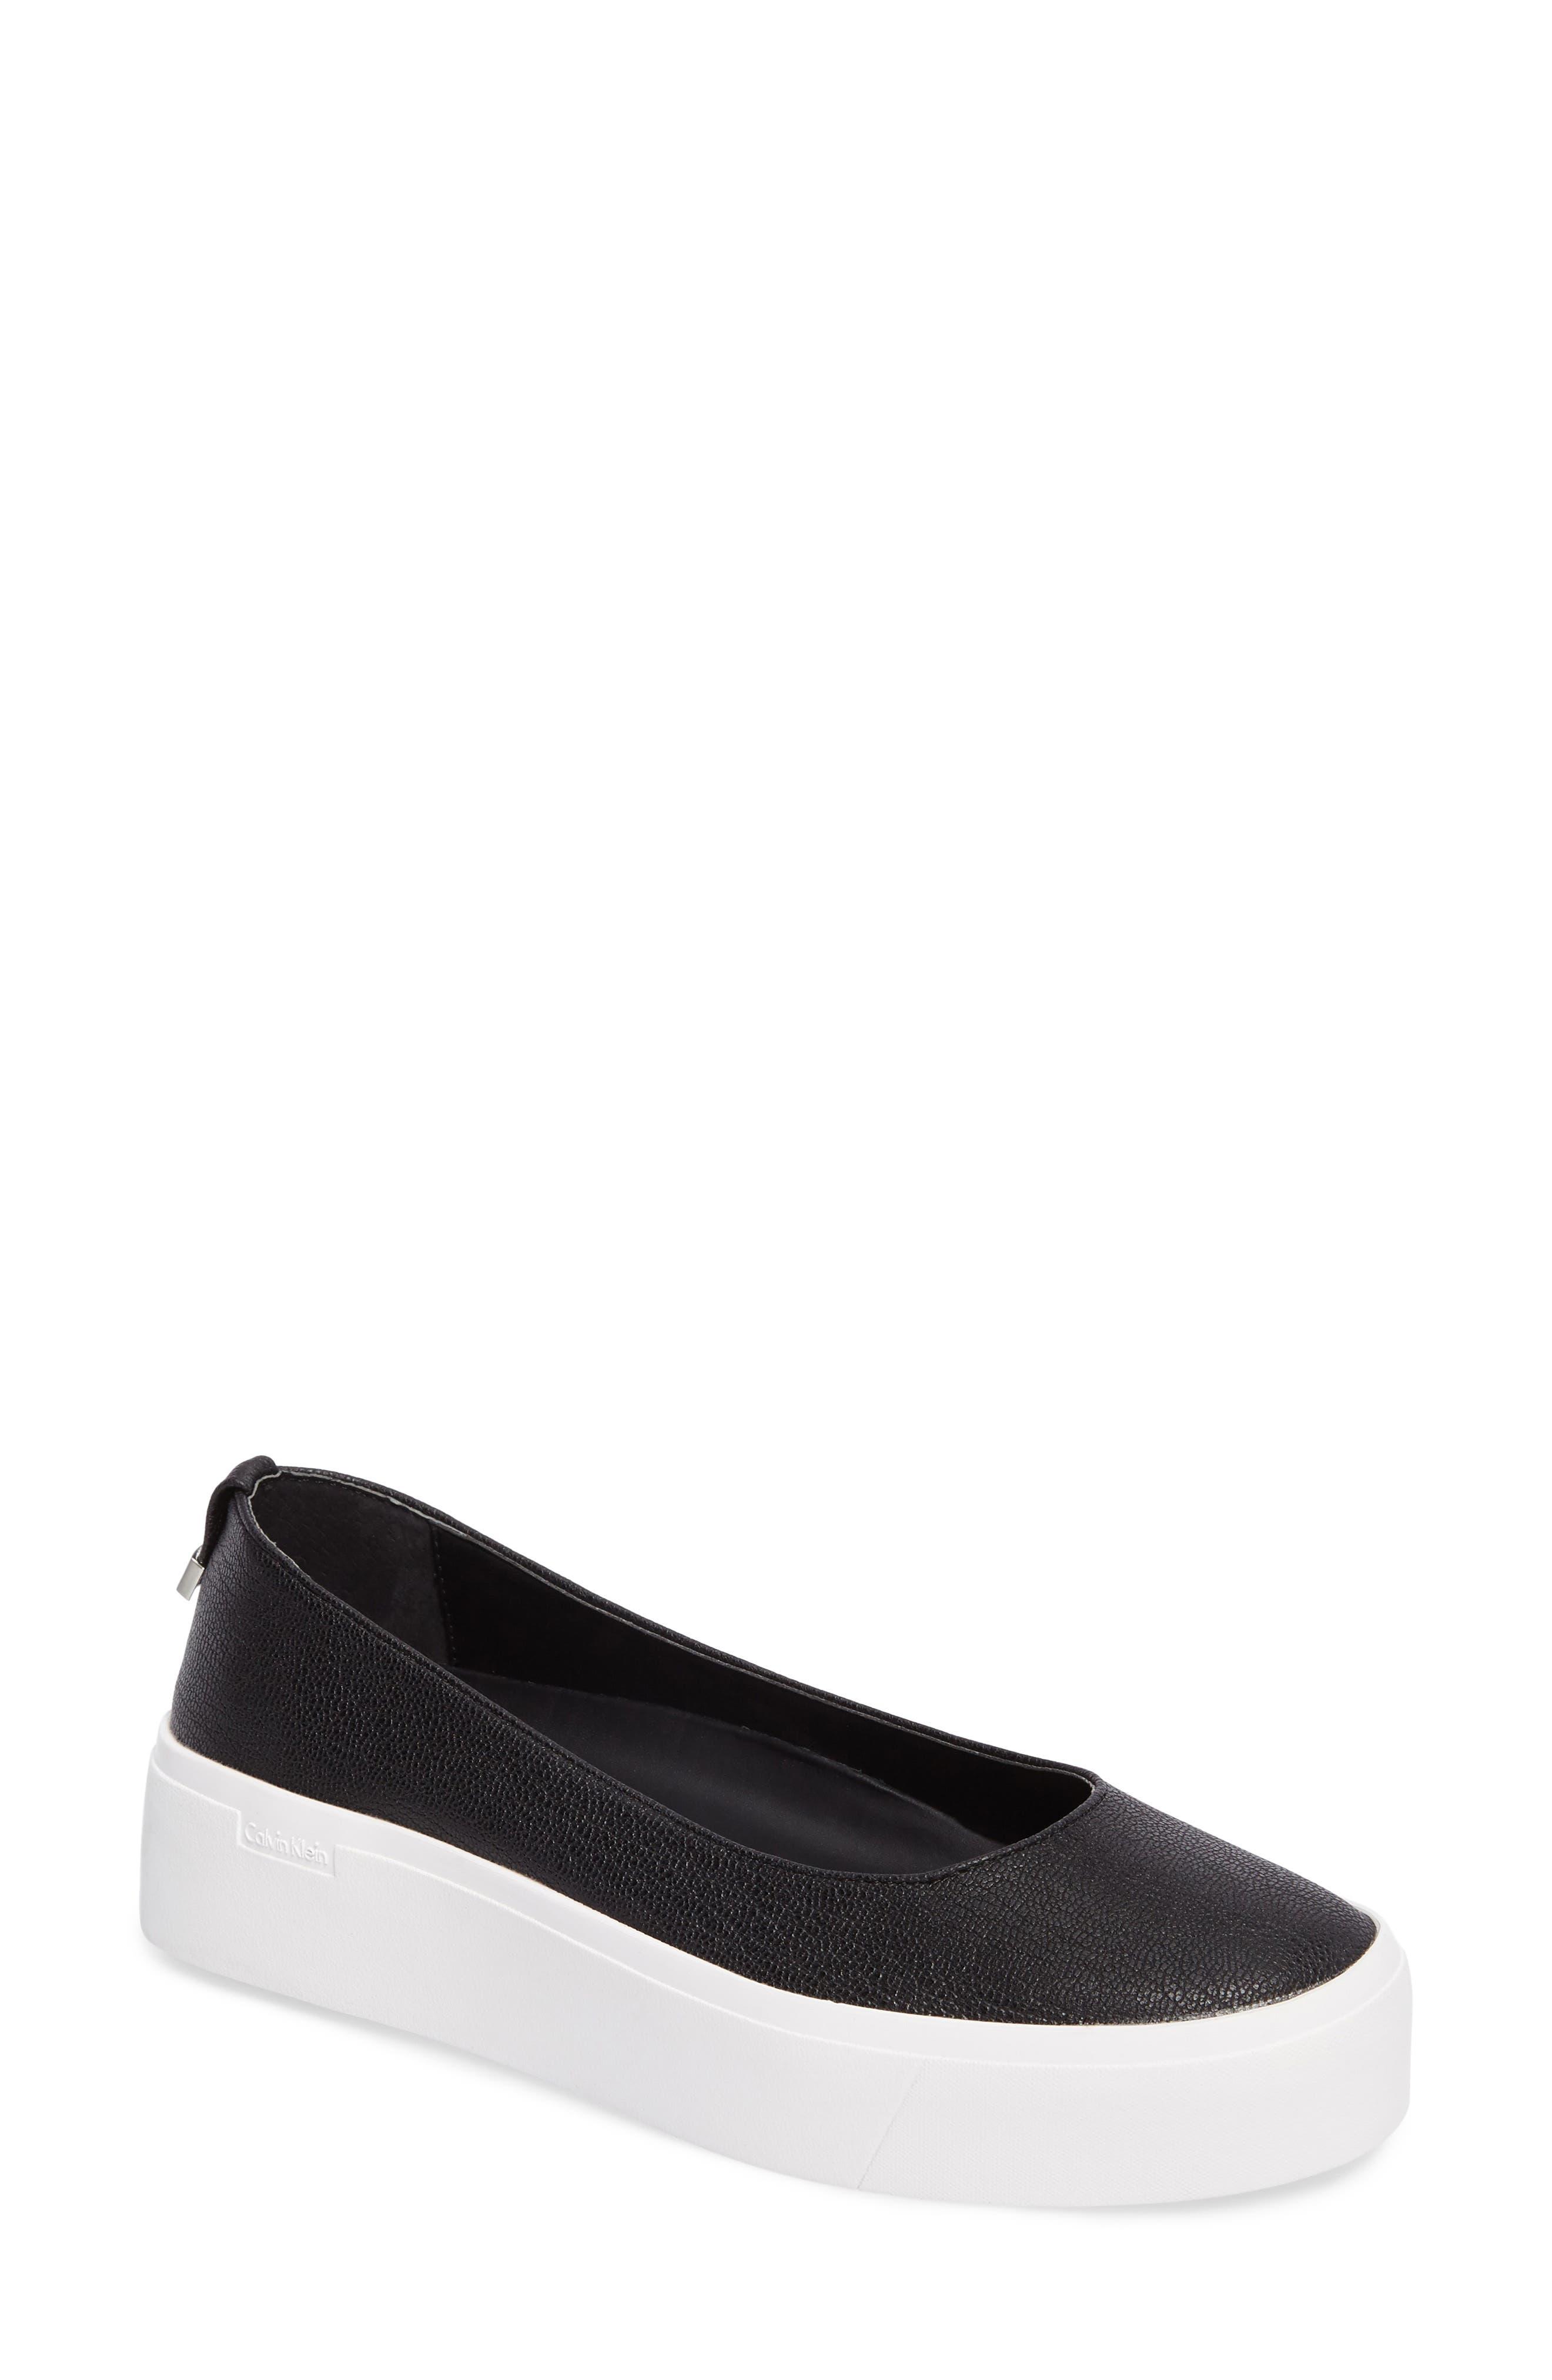 Janie Platform Flat,                             Main thumbnail 1, color,                             Black Pebble Leather